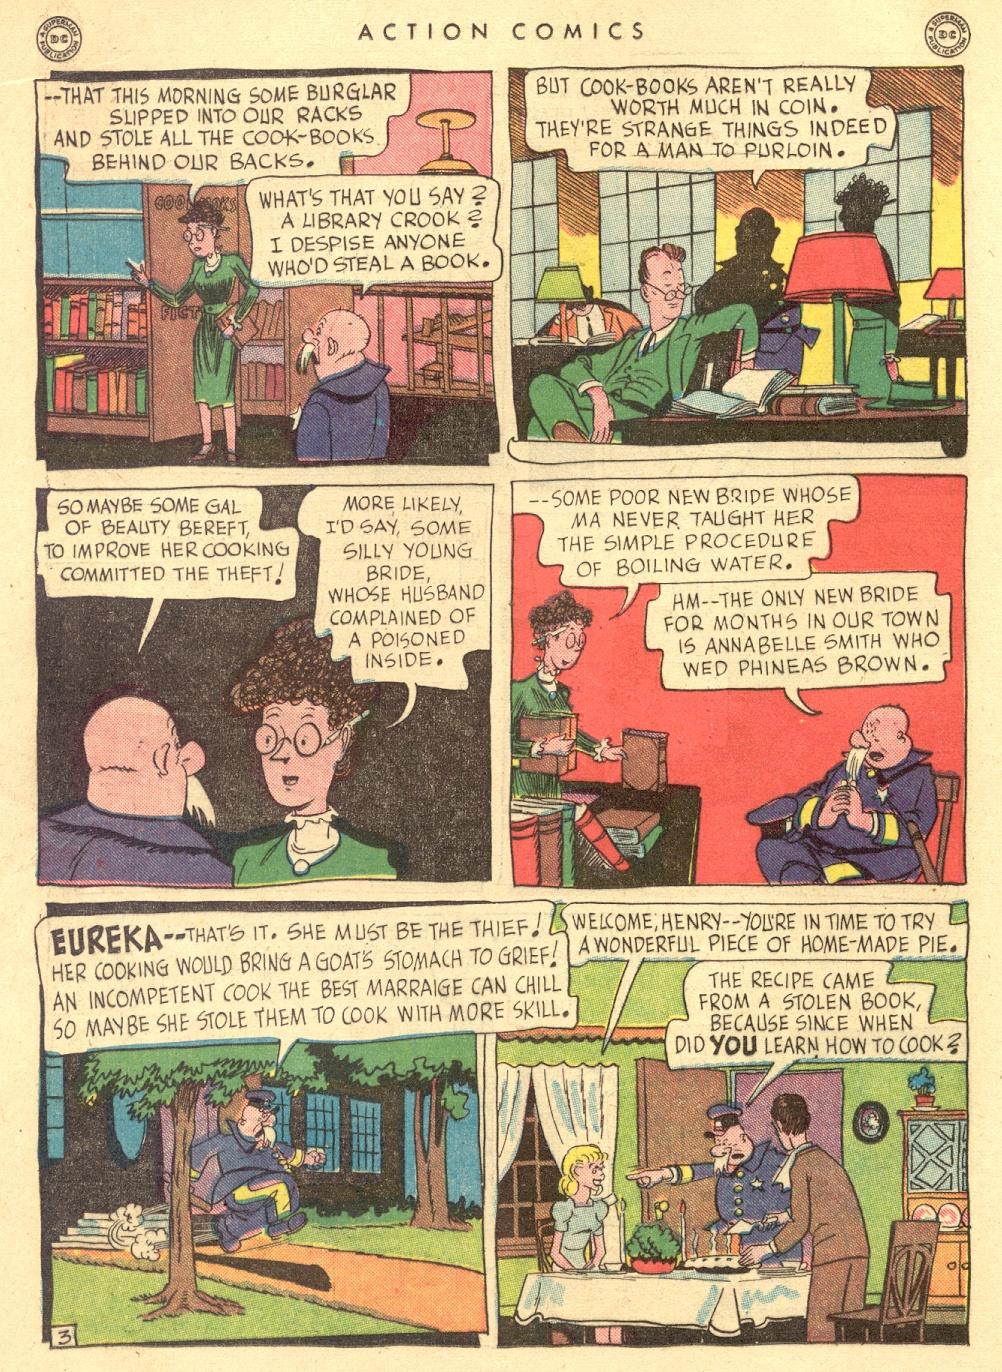 Action Comics (1938) 93 Page 21